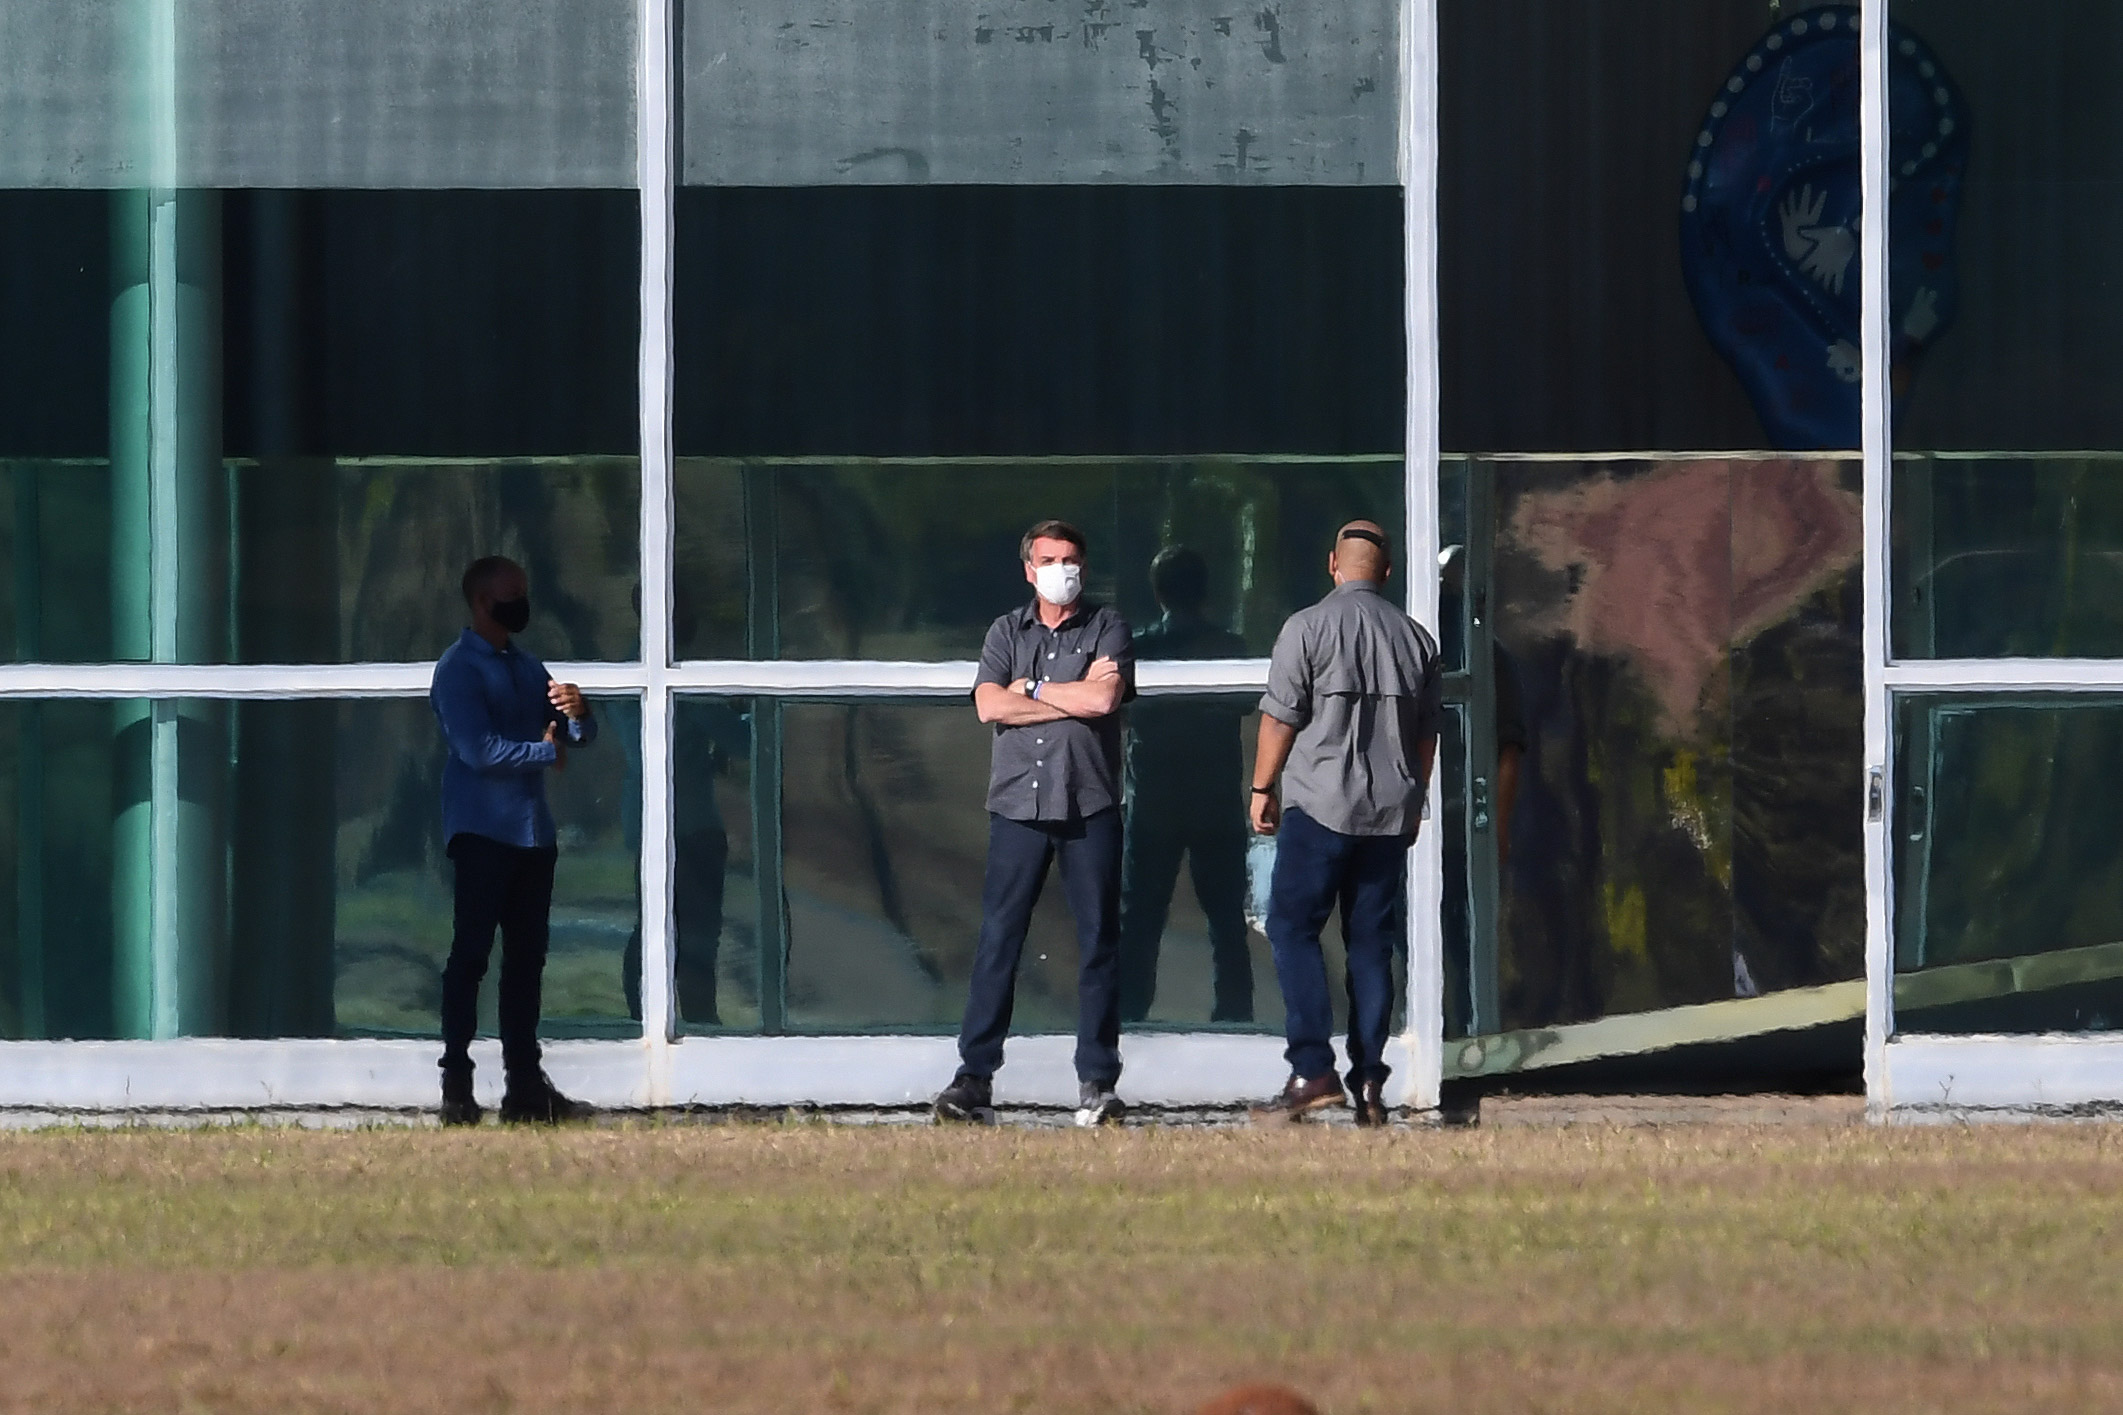 Brazilian President Jair Bolsonaro, center, is seen outside the Alvorada Palace in Brasilia, Brazil, on July 10.